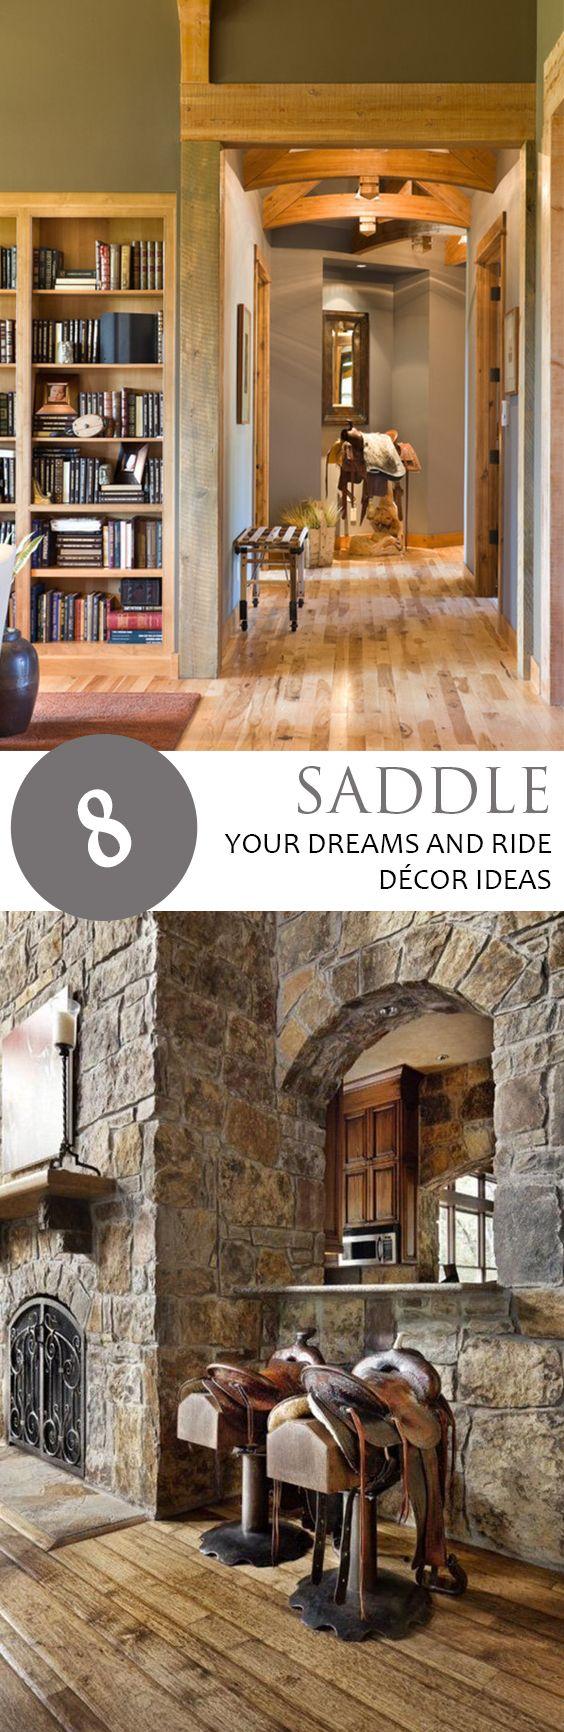 rustic decor, rustic decor ideas, rustic home decor, diy rustic